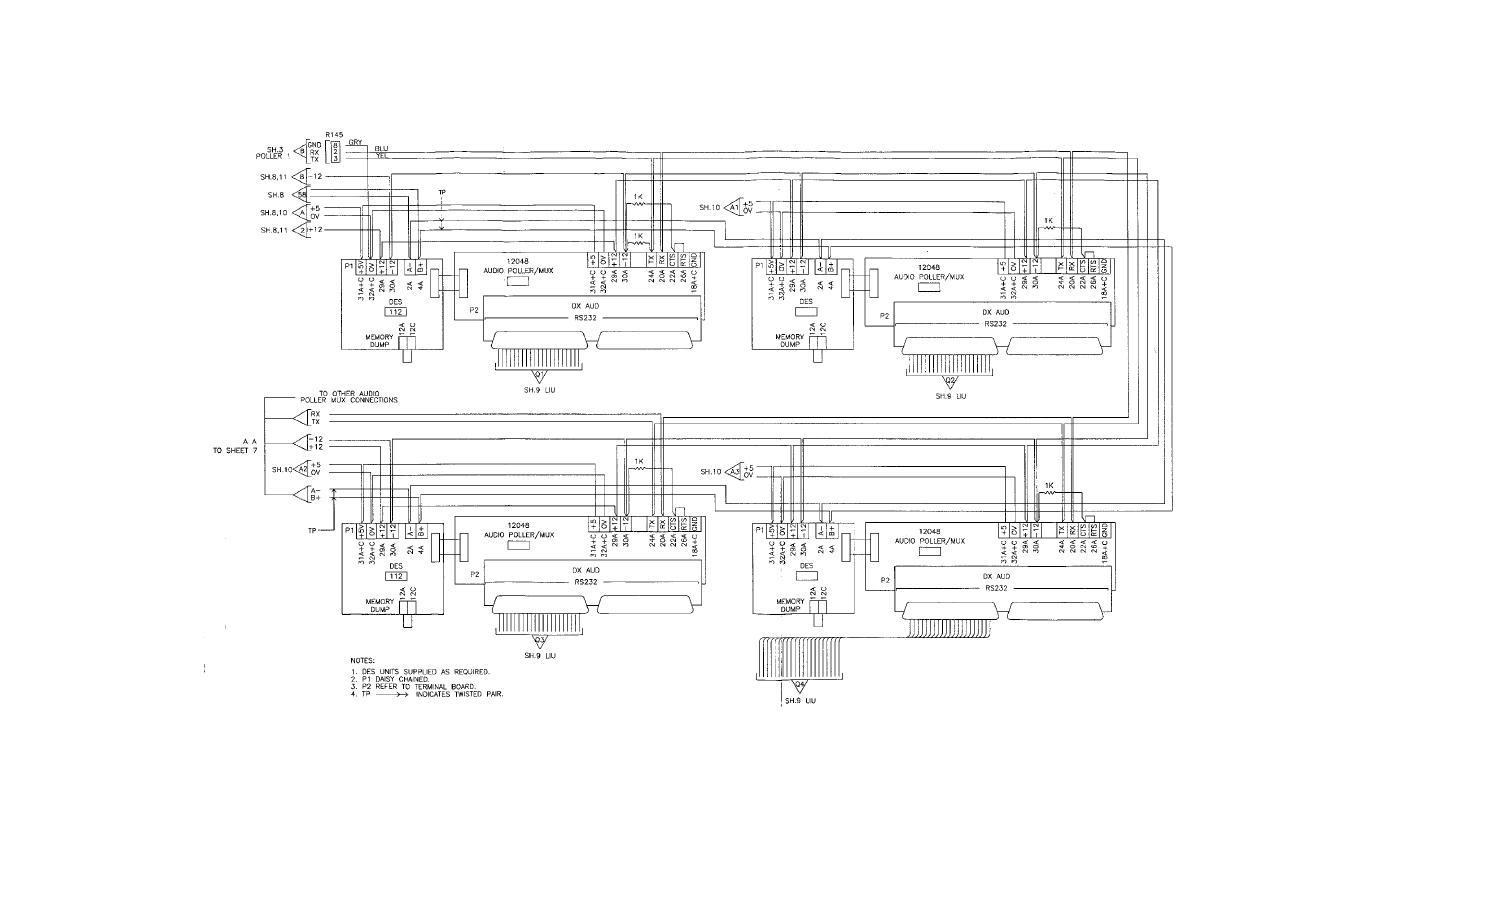 fo 2 pmc functional wiring block diagram sheet 5 of 11 With fo2 pmc functional wiring block diagram sheet 6 of 11